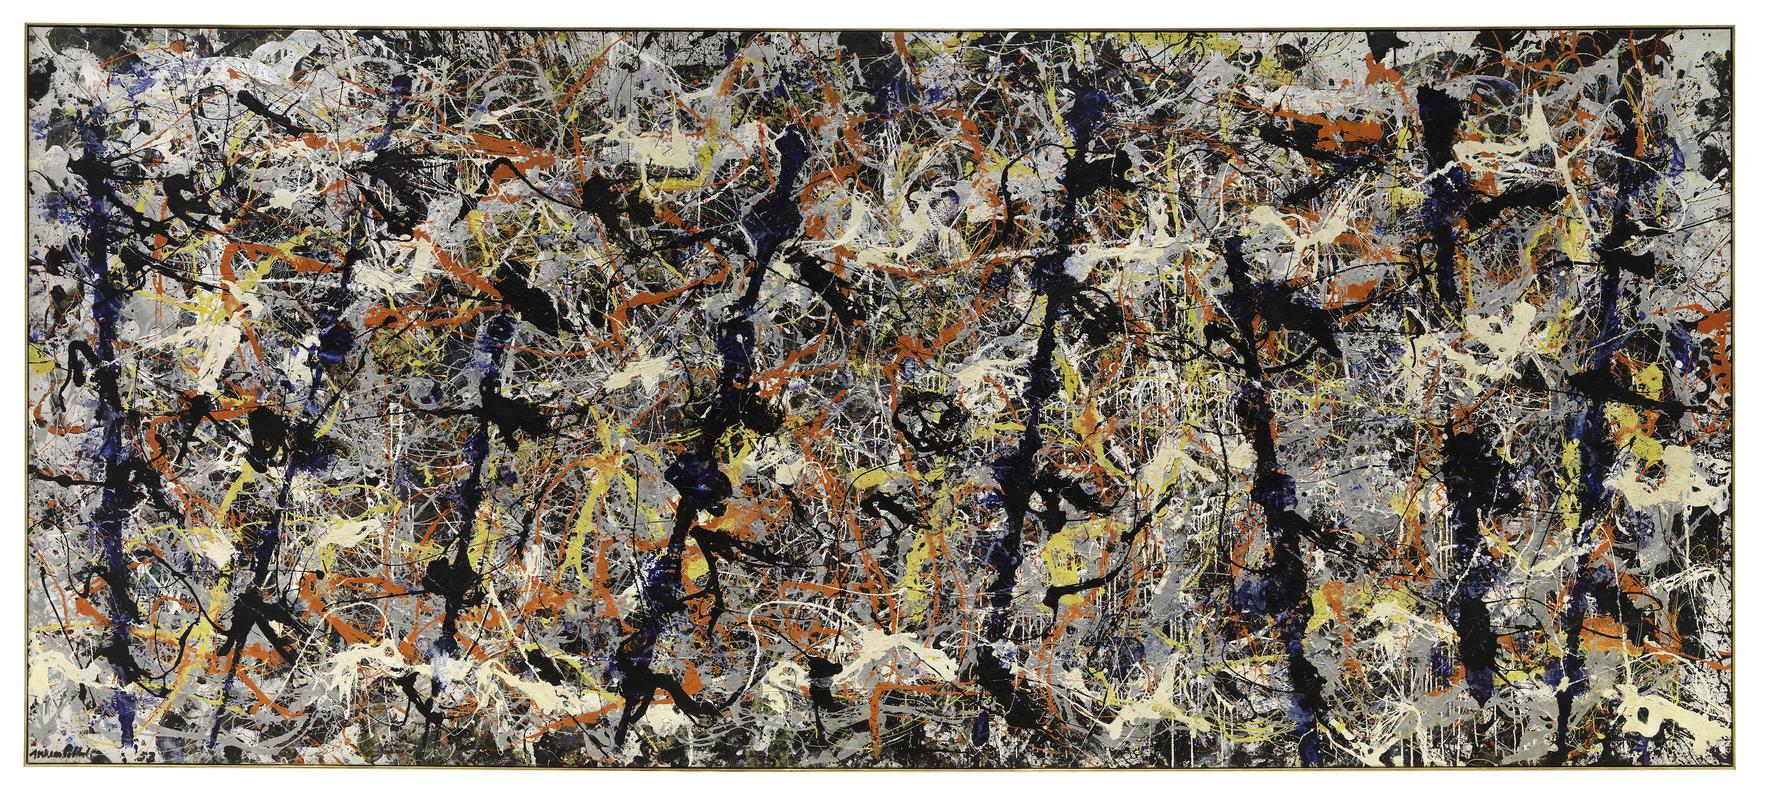 Jackson Pollock,  Blue Poles , 1952, National Gallery of Australia, Canberra.